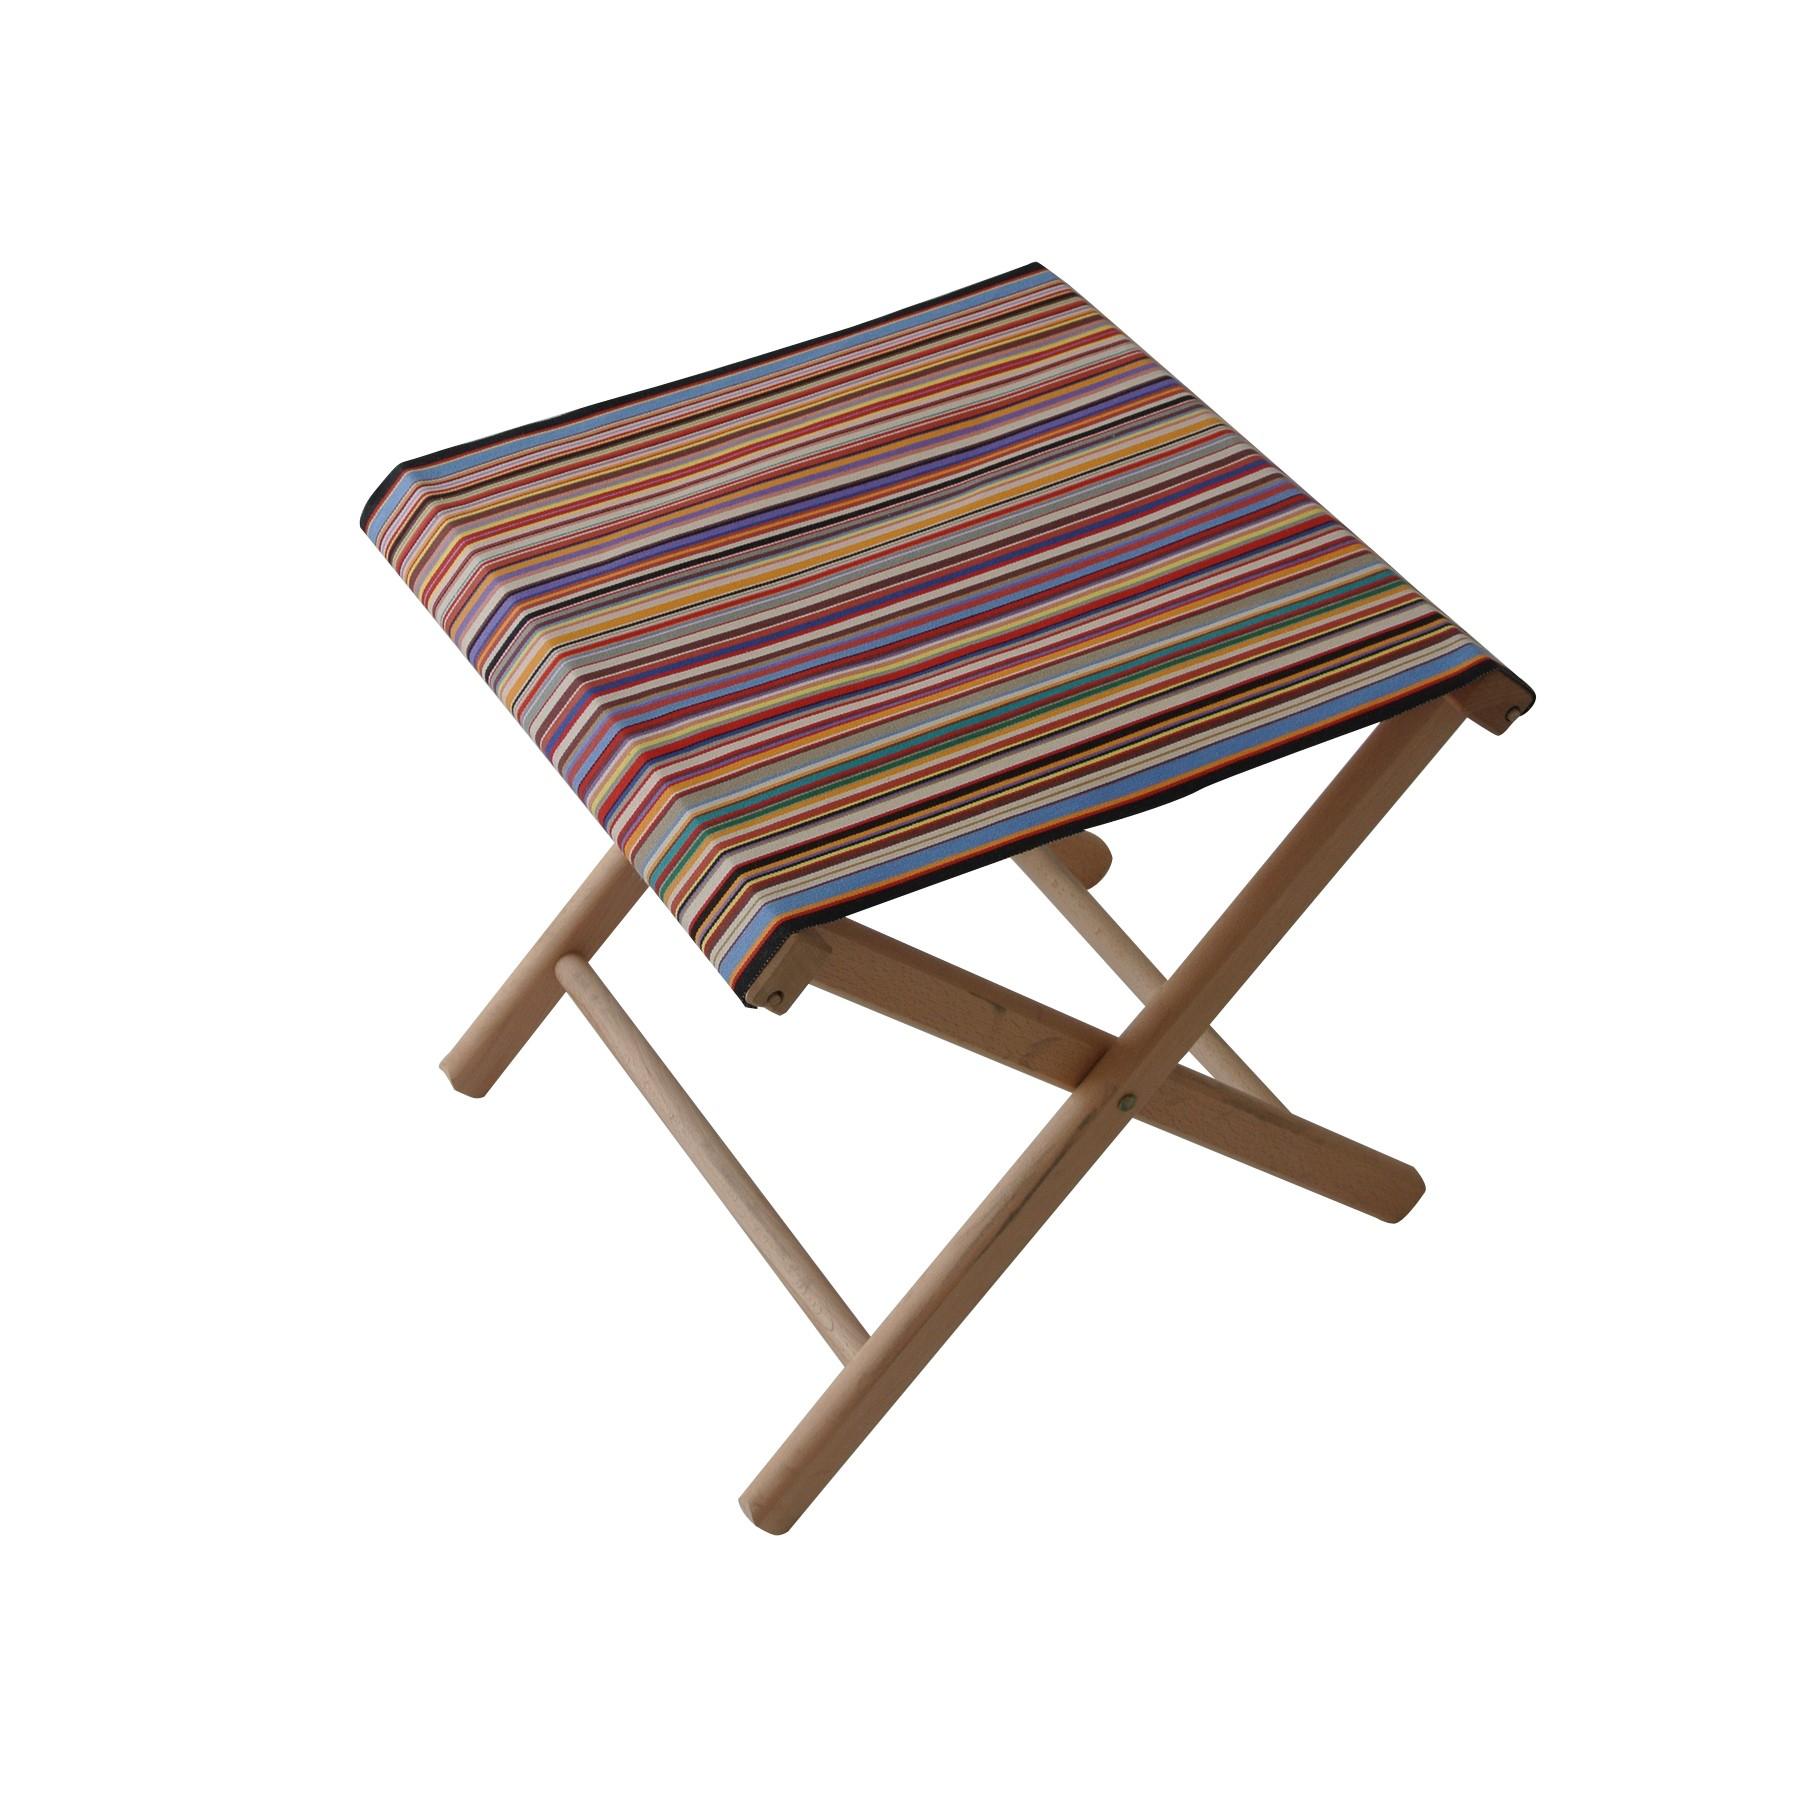 Fishing stool 100 cotton beech wood le petit jardin for Petit jardin